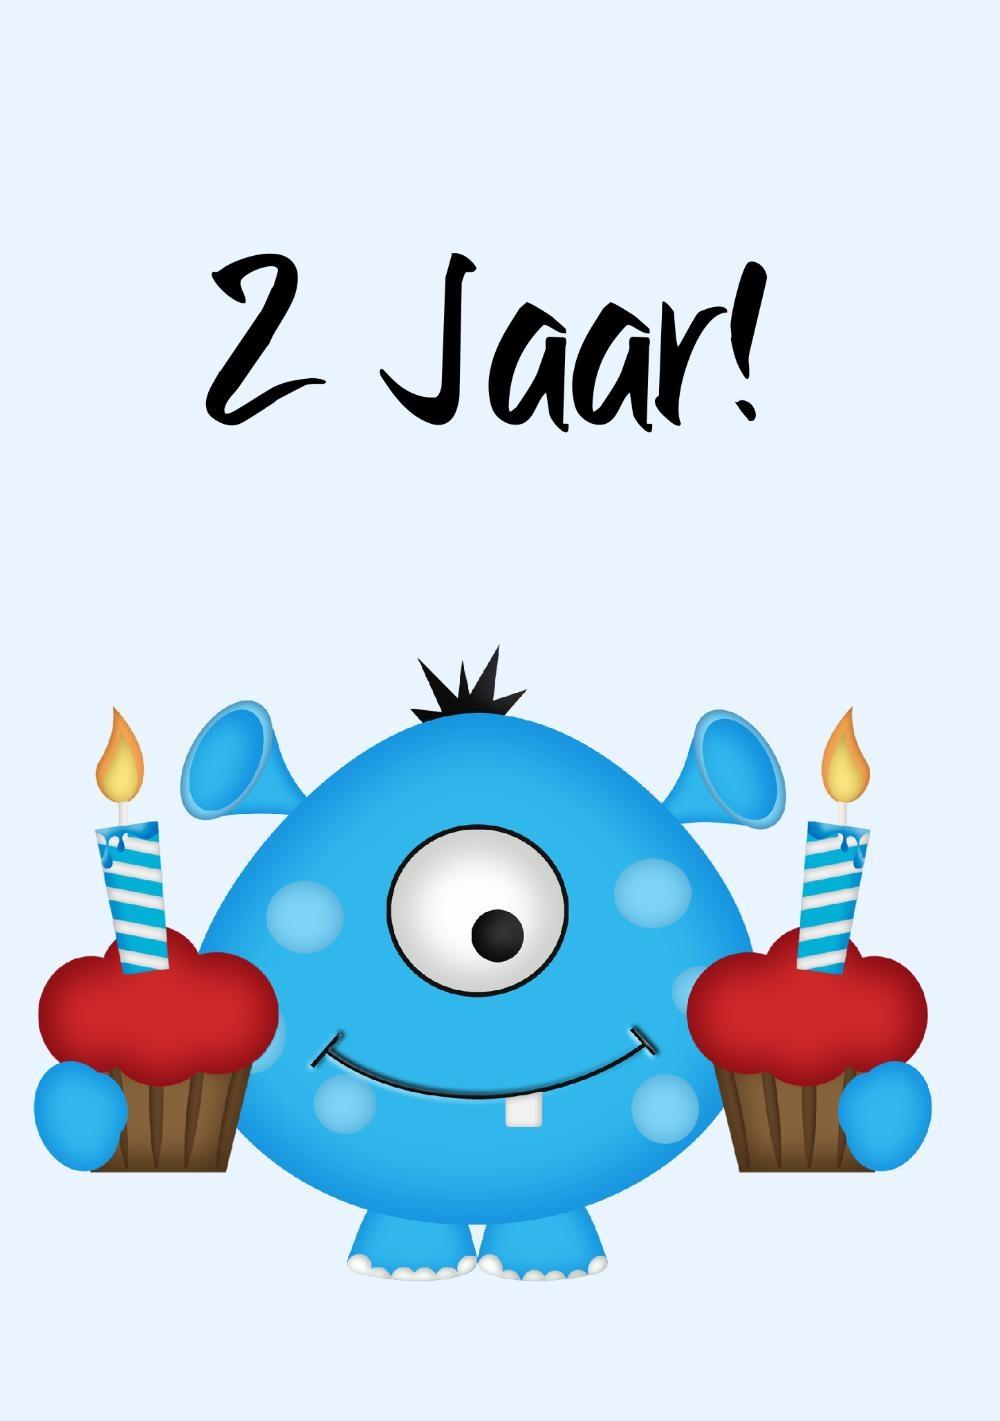 verjaardagskaart kind 2 jaar Verjaardagskaart 2 jaar blauw monster   Kaartjeposten verjaardagskaart kind 2 jaar